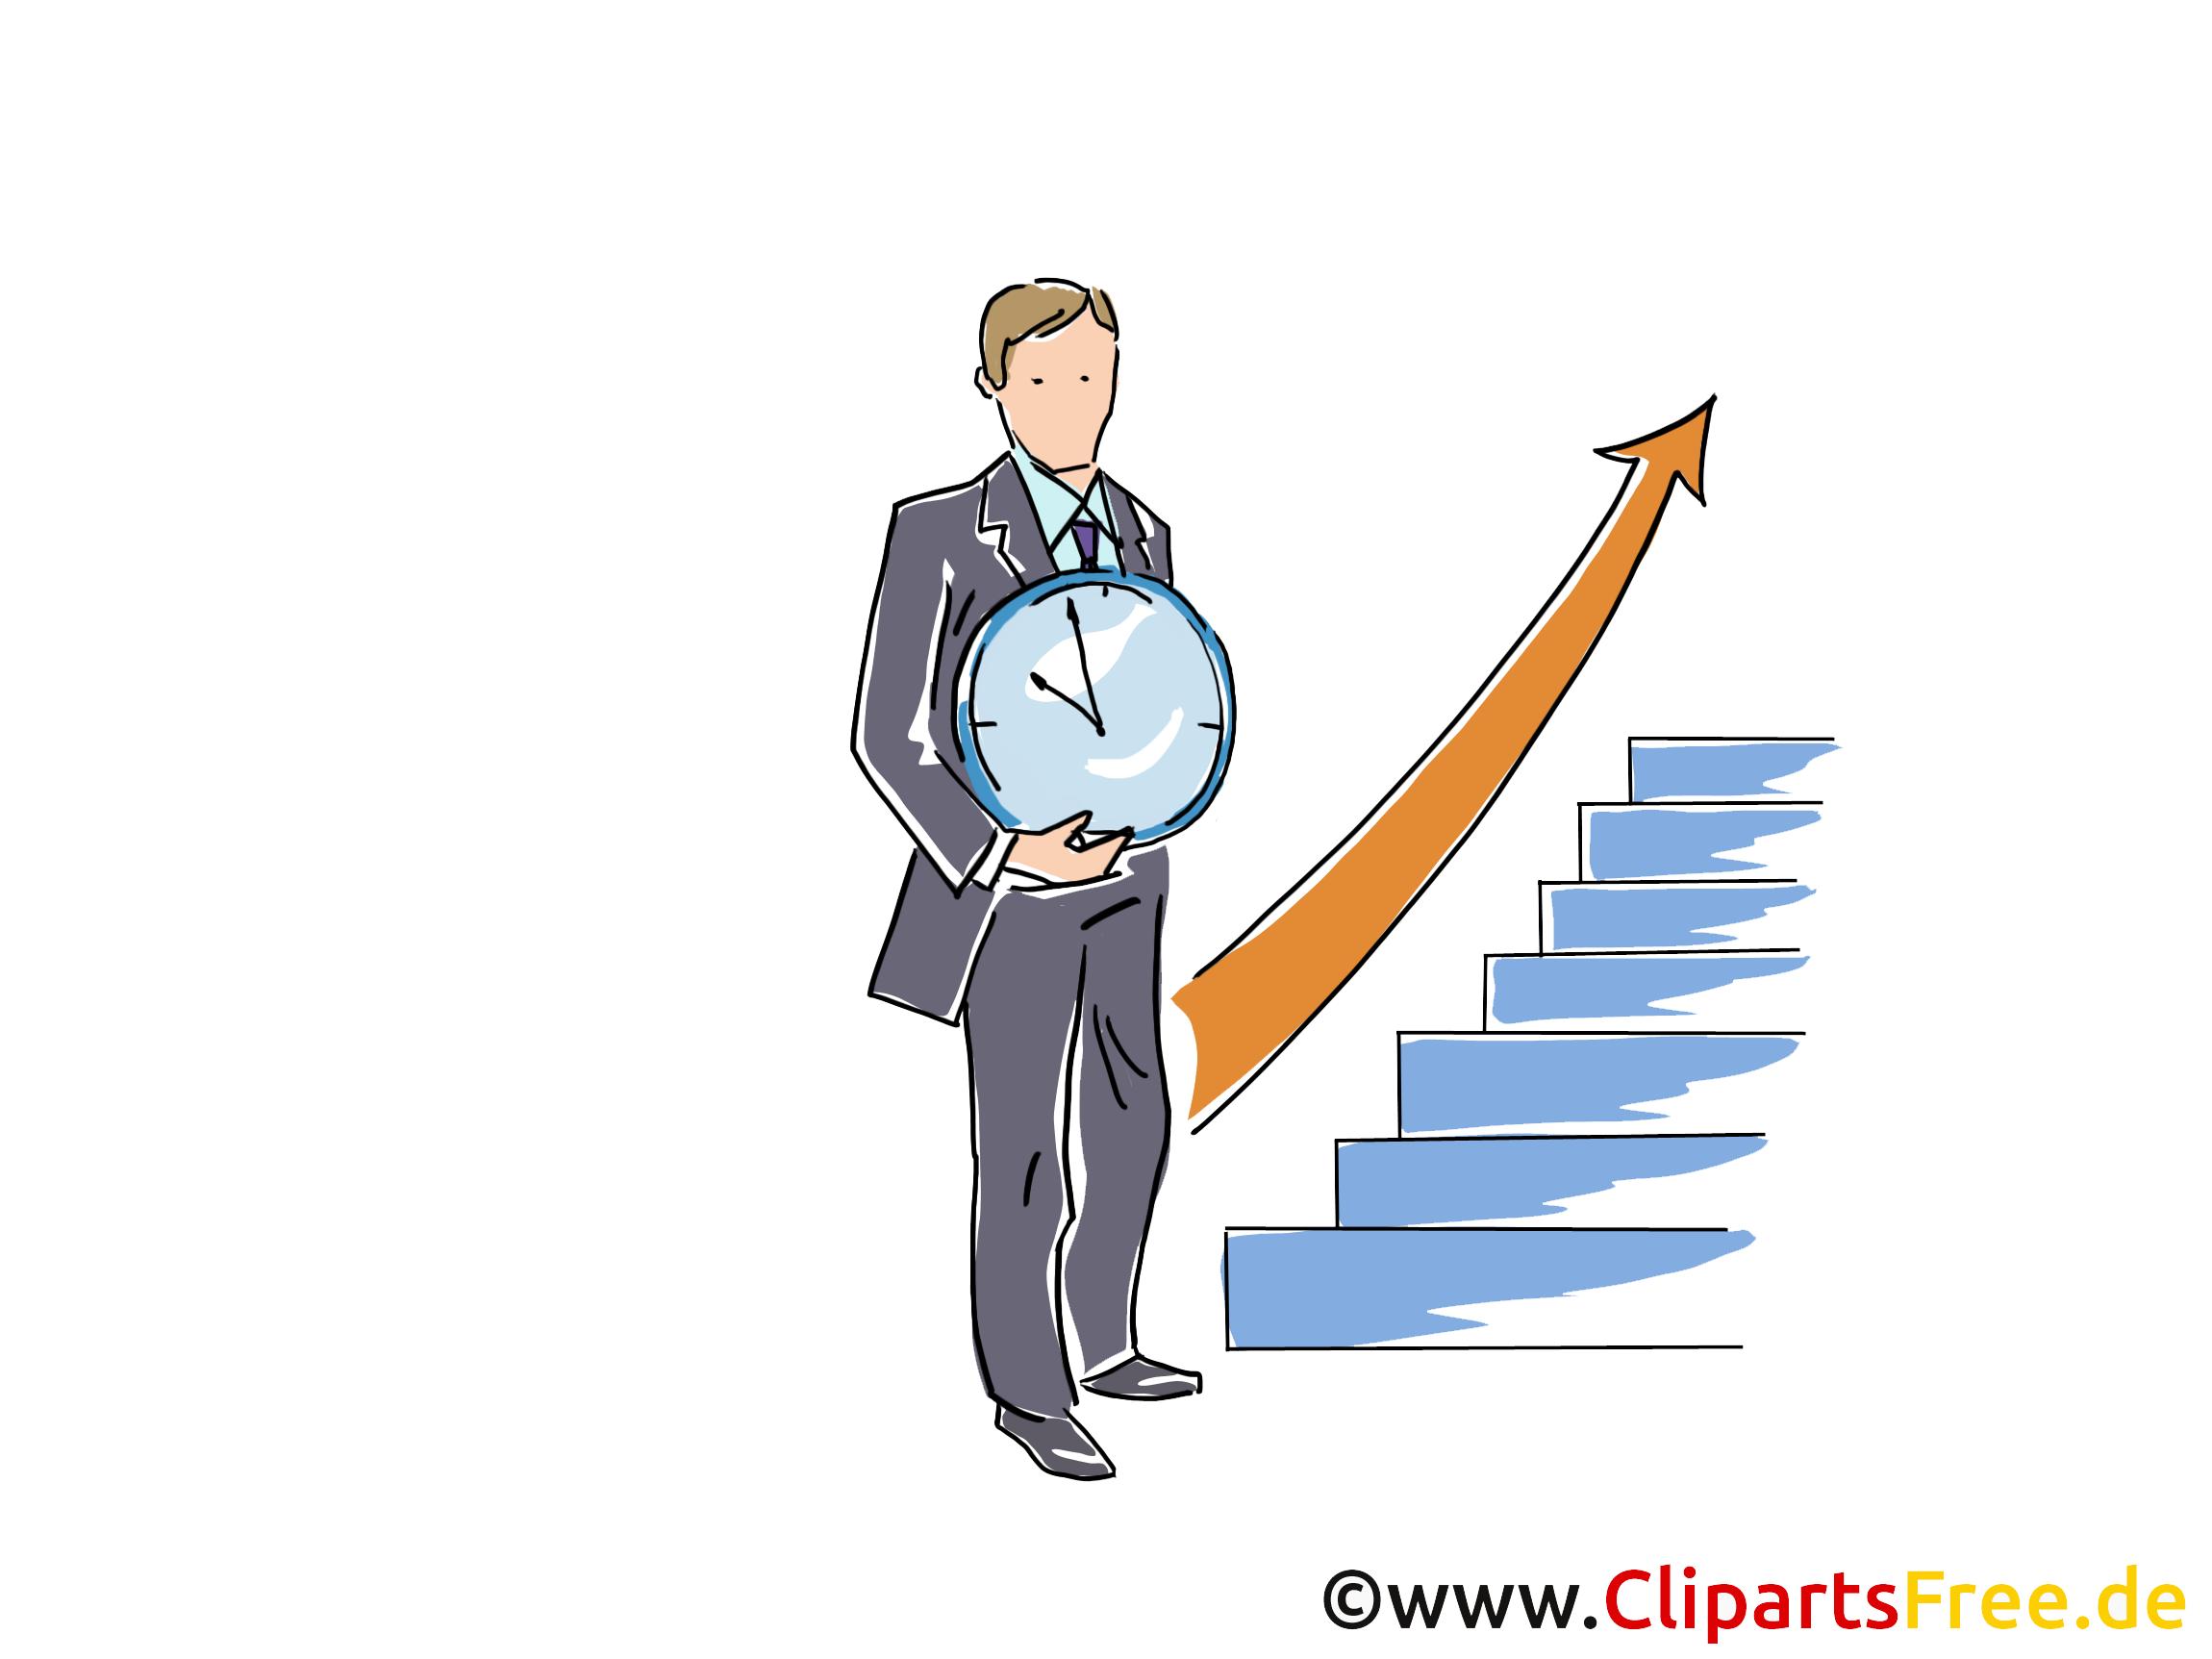 Strategie Clipart, Grafik, Bild, Cartoon